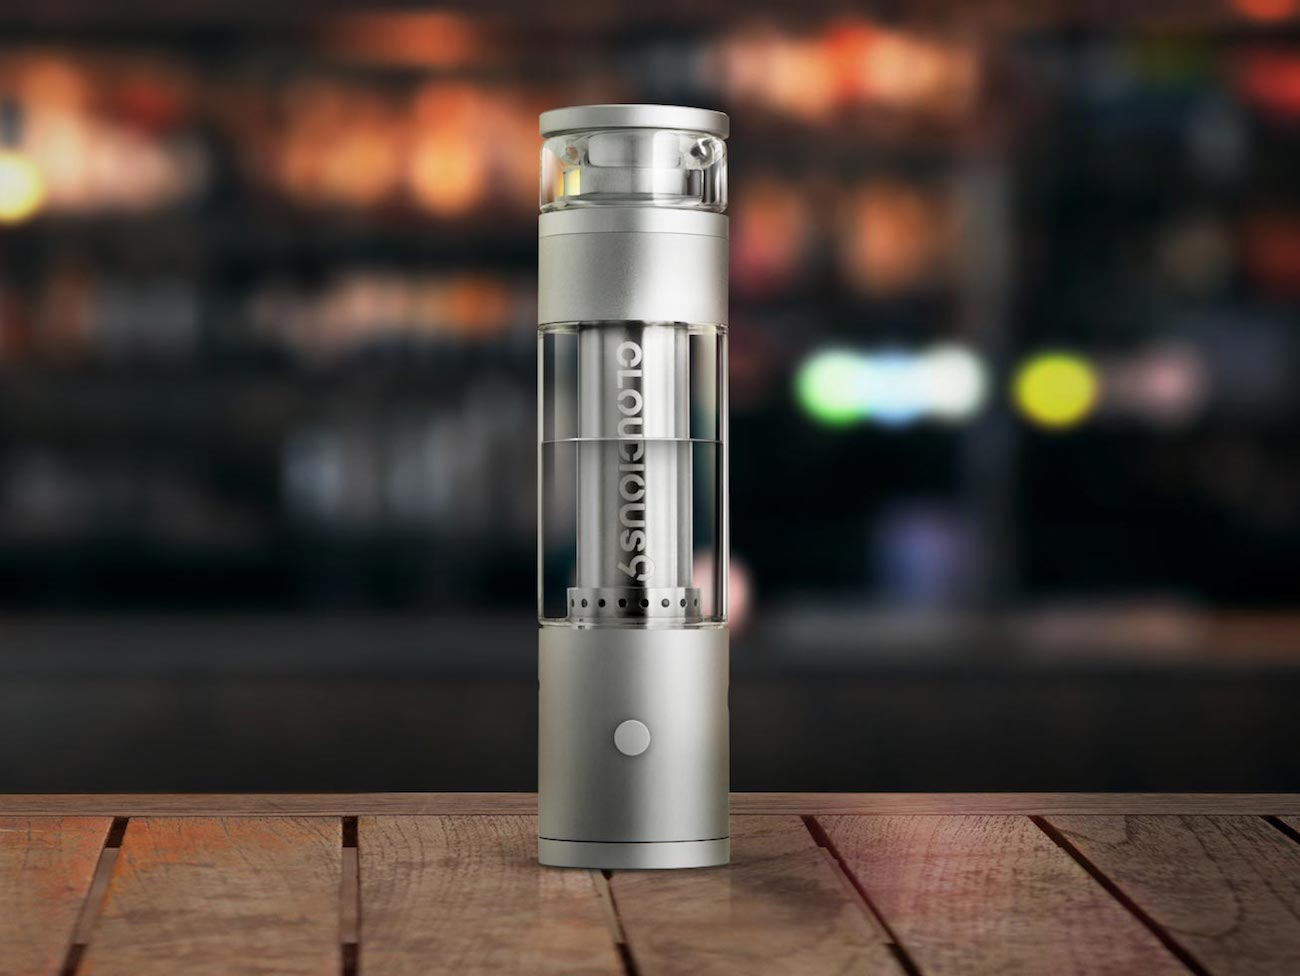 Hydrology9 Liquid Filtration Dry Herb Vaporizer